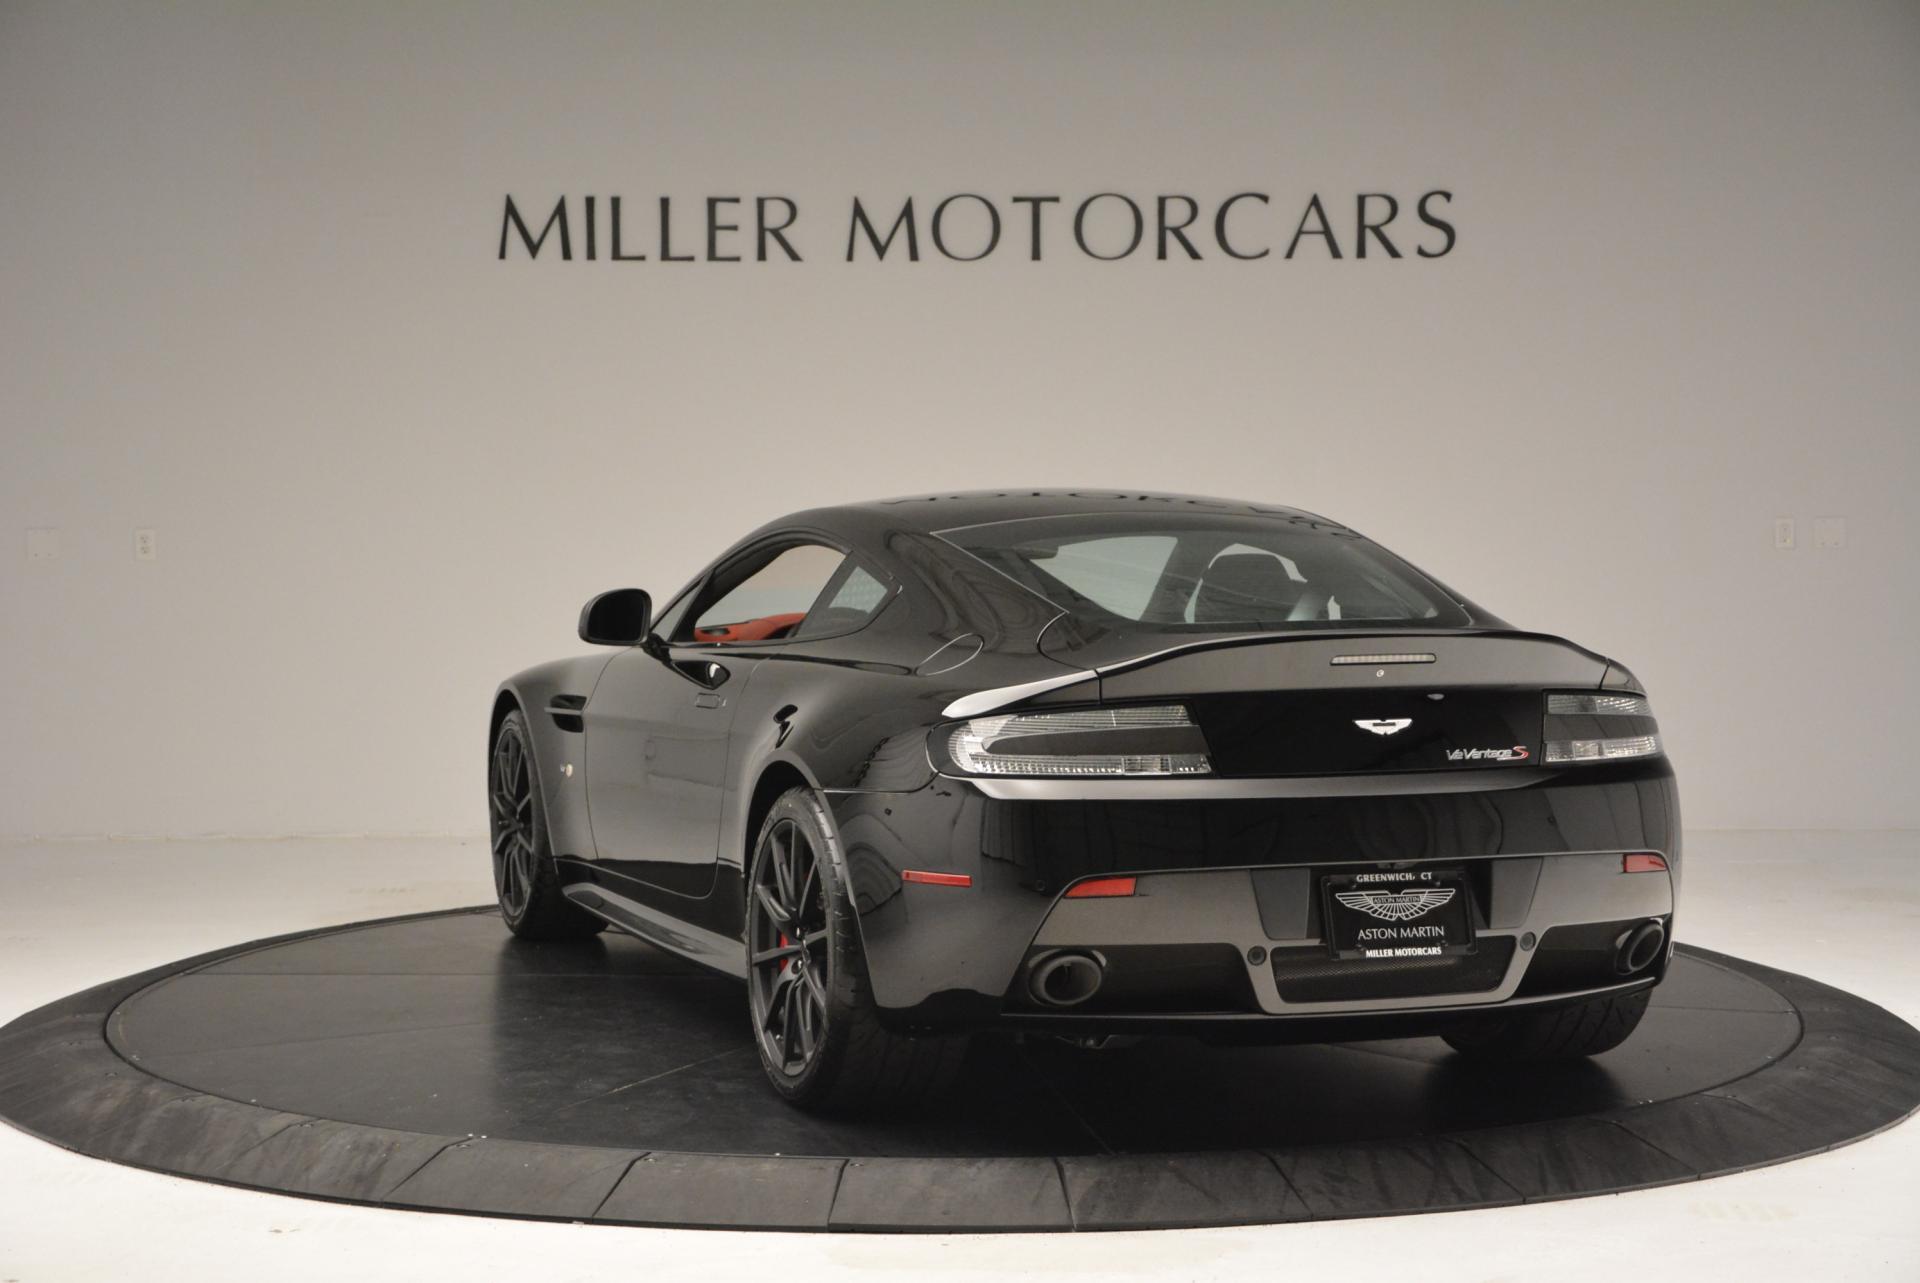 New 2015 Aston Martin V12 Vantage S  For Sale In Greenwich, CT 103_p5